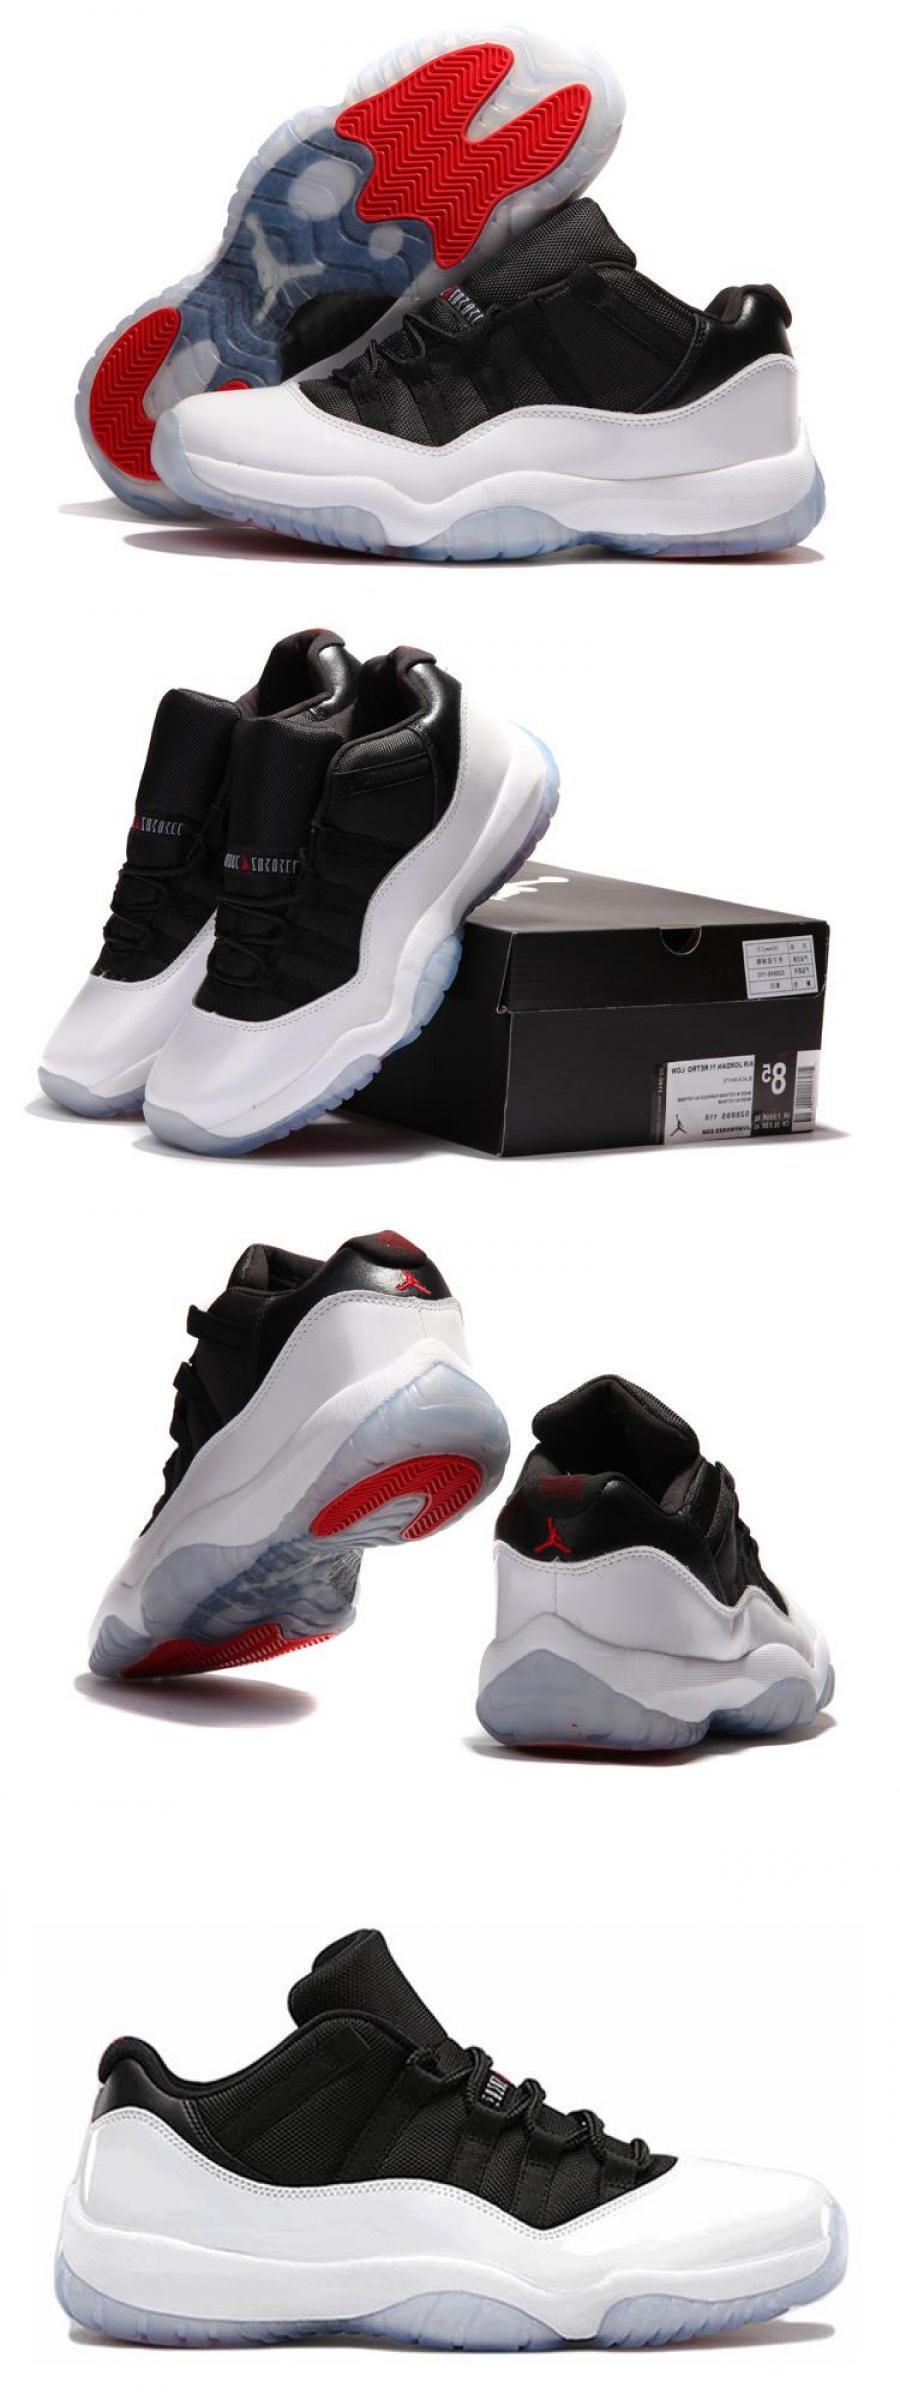 Air Jordan 11 Retro Low White/blacktrue Red in 2020